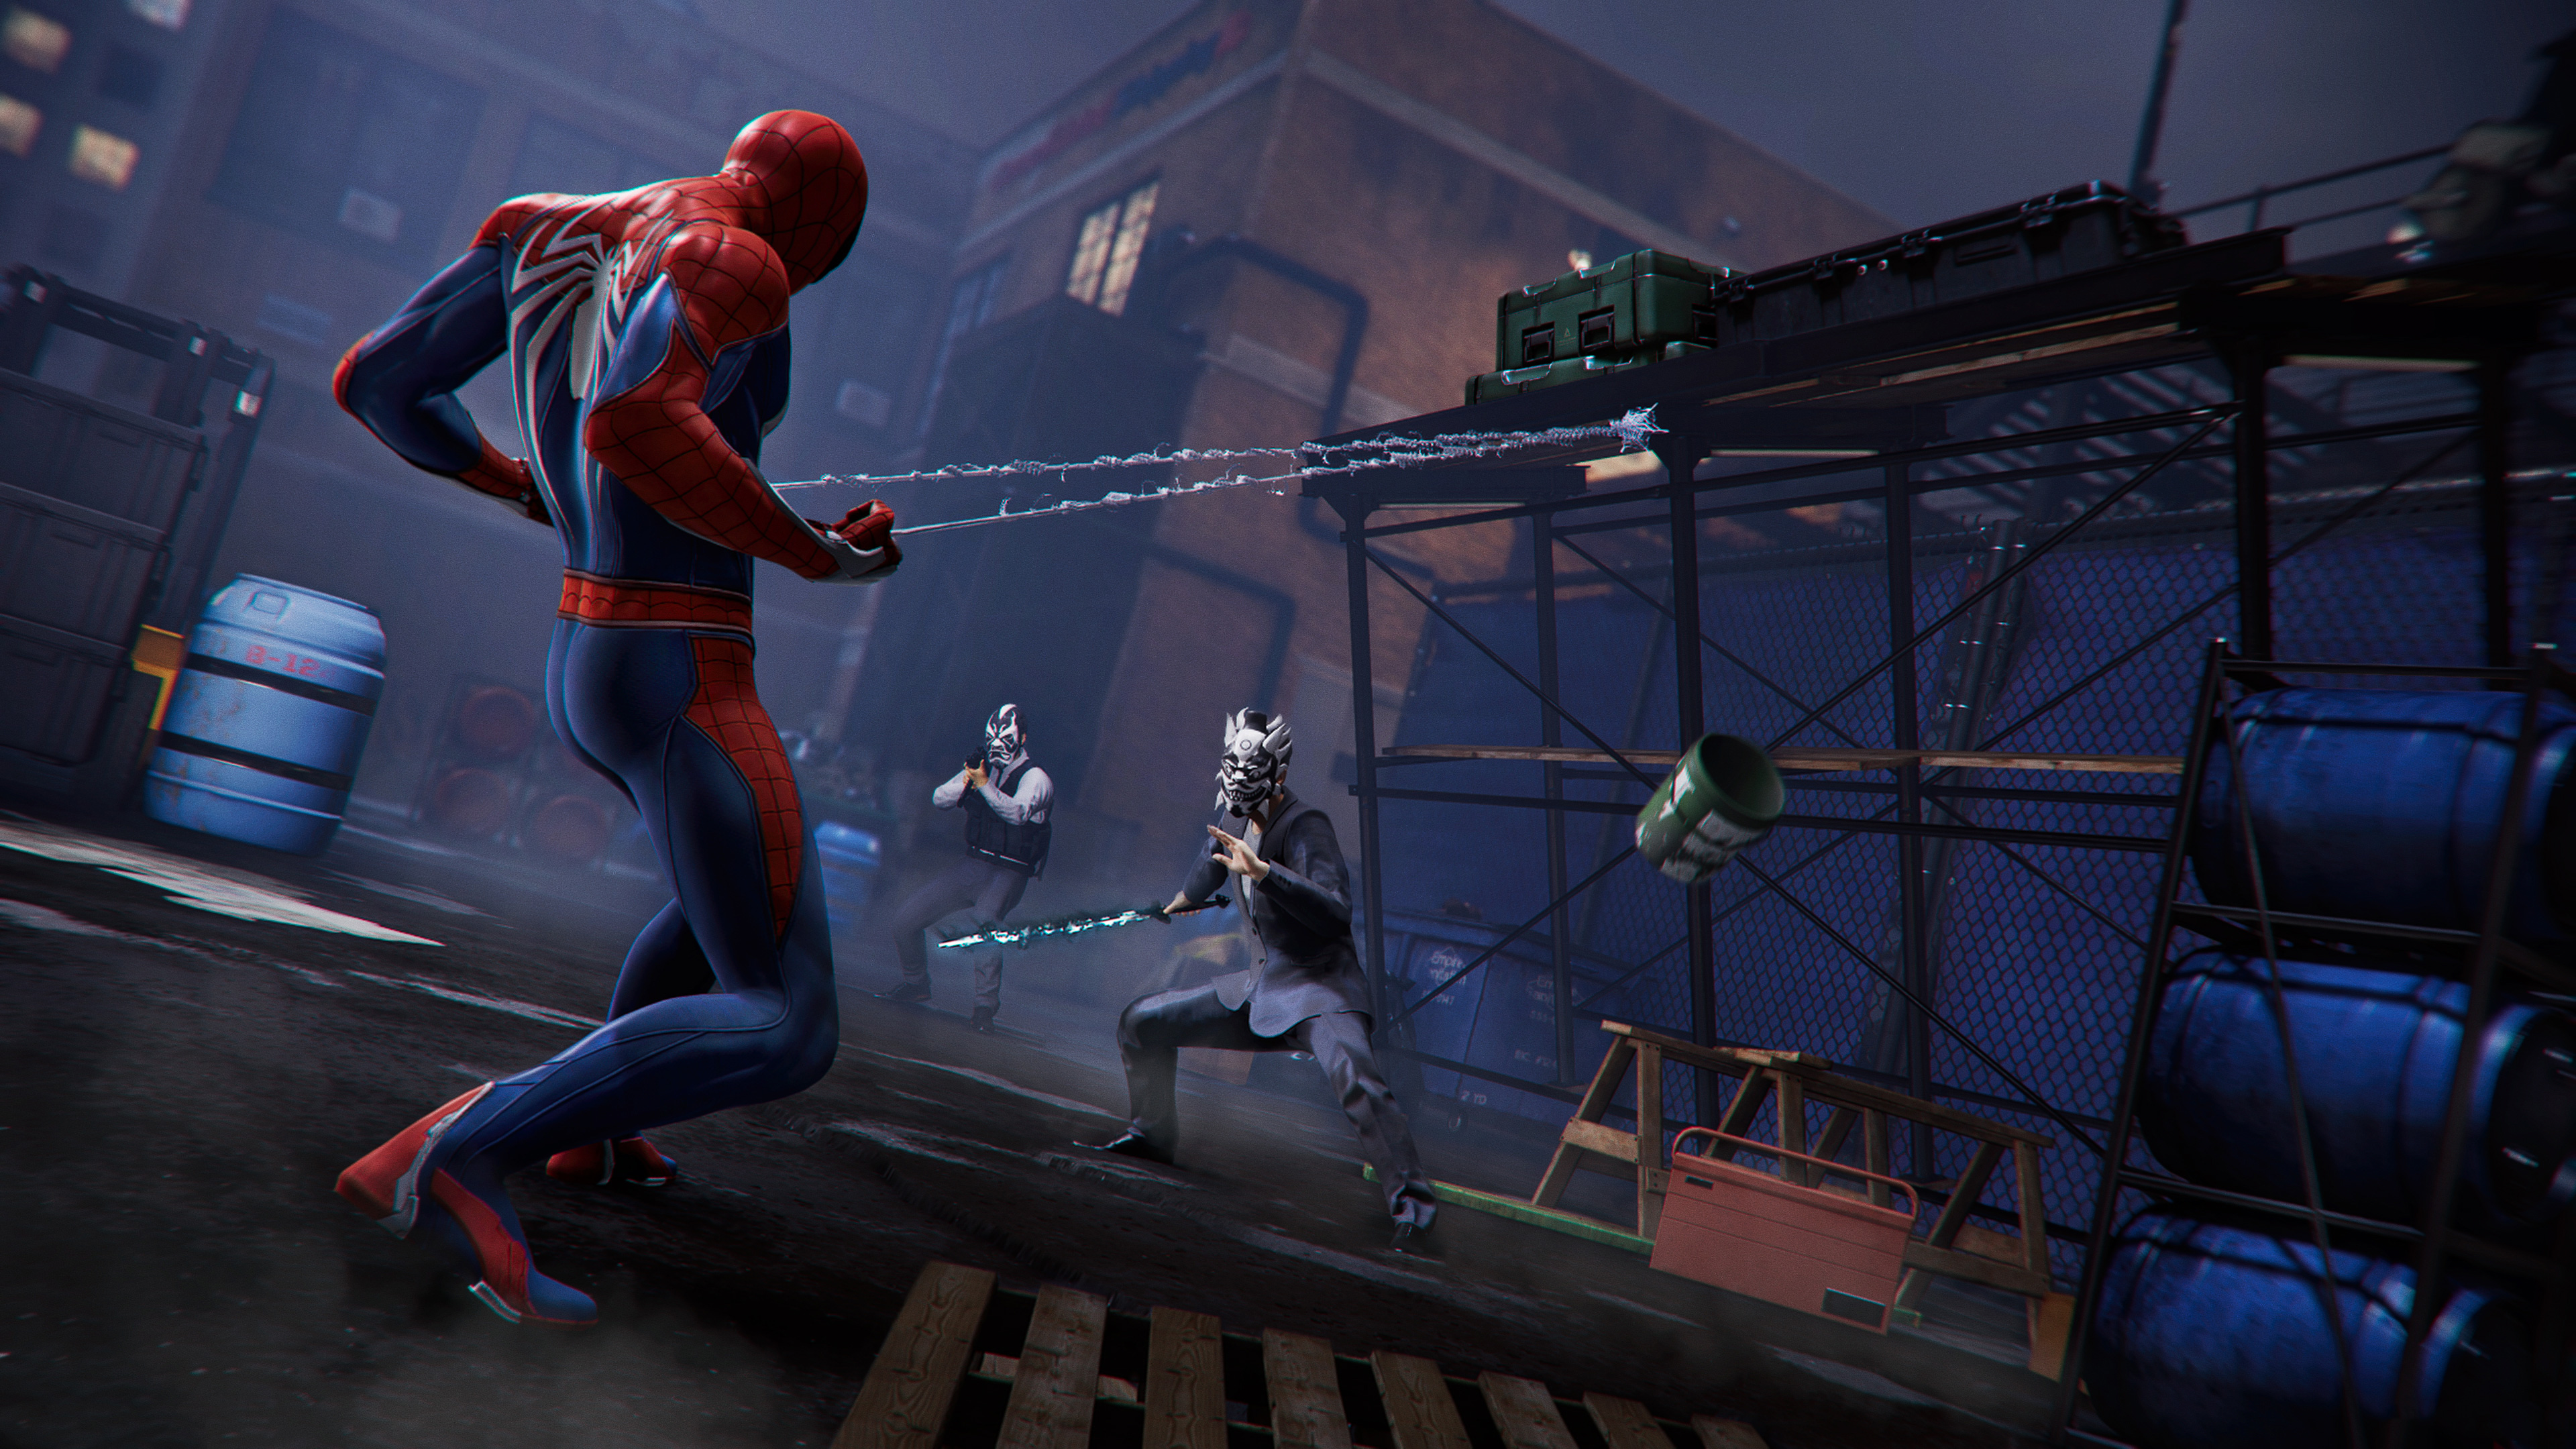 Spiderman ps4 pro gaming 4k hd games 4k wallpapers - 4k wallpapers games ...